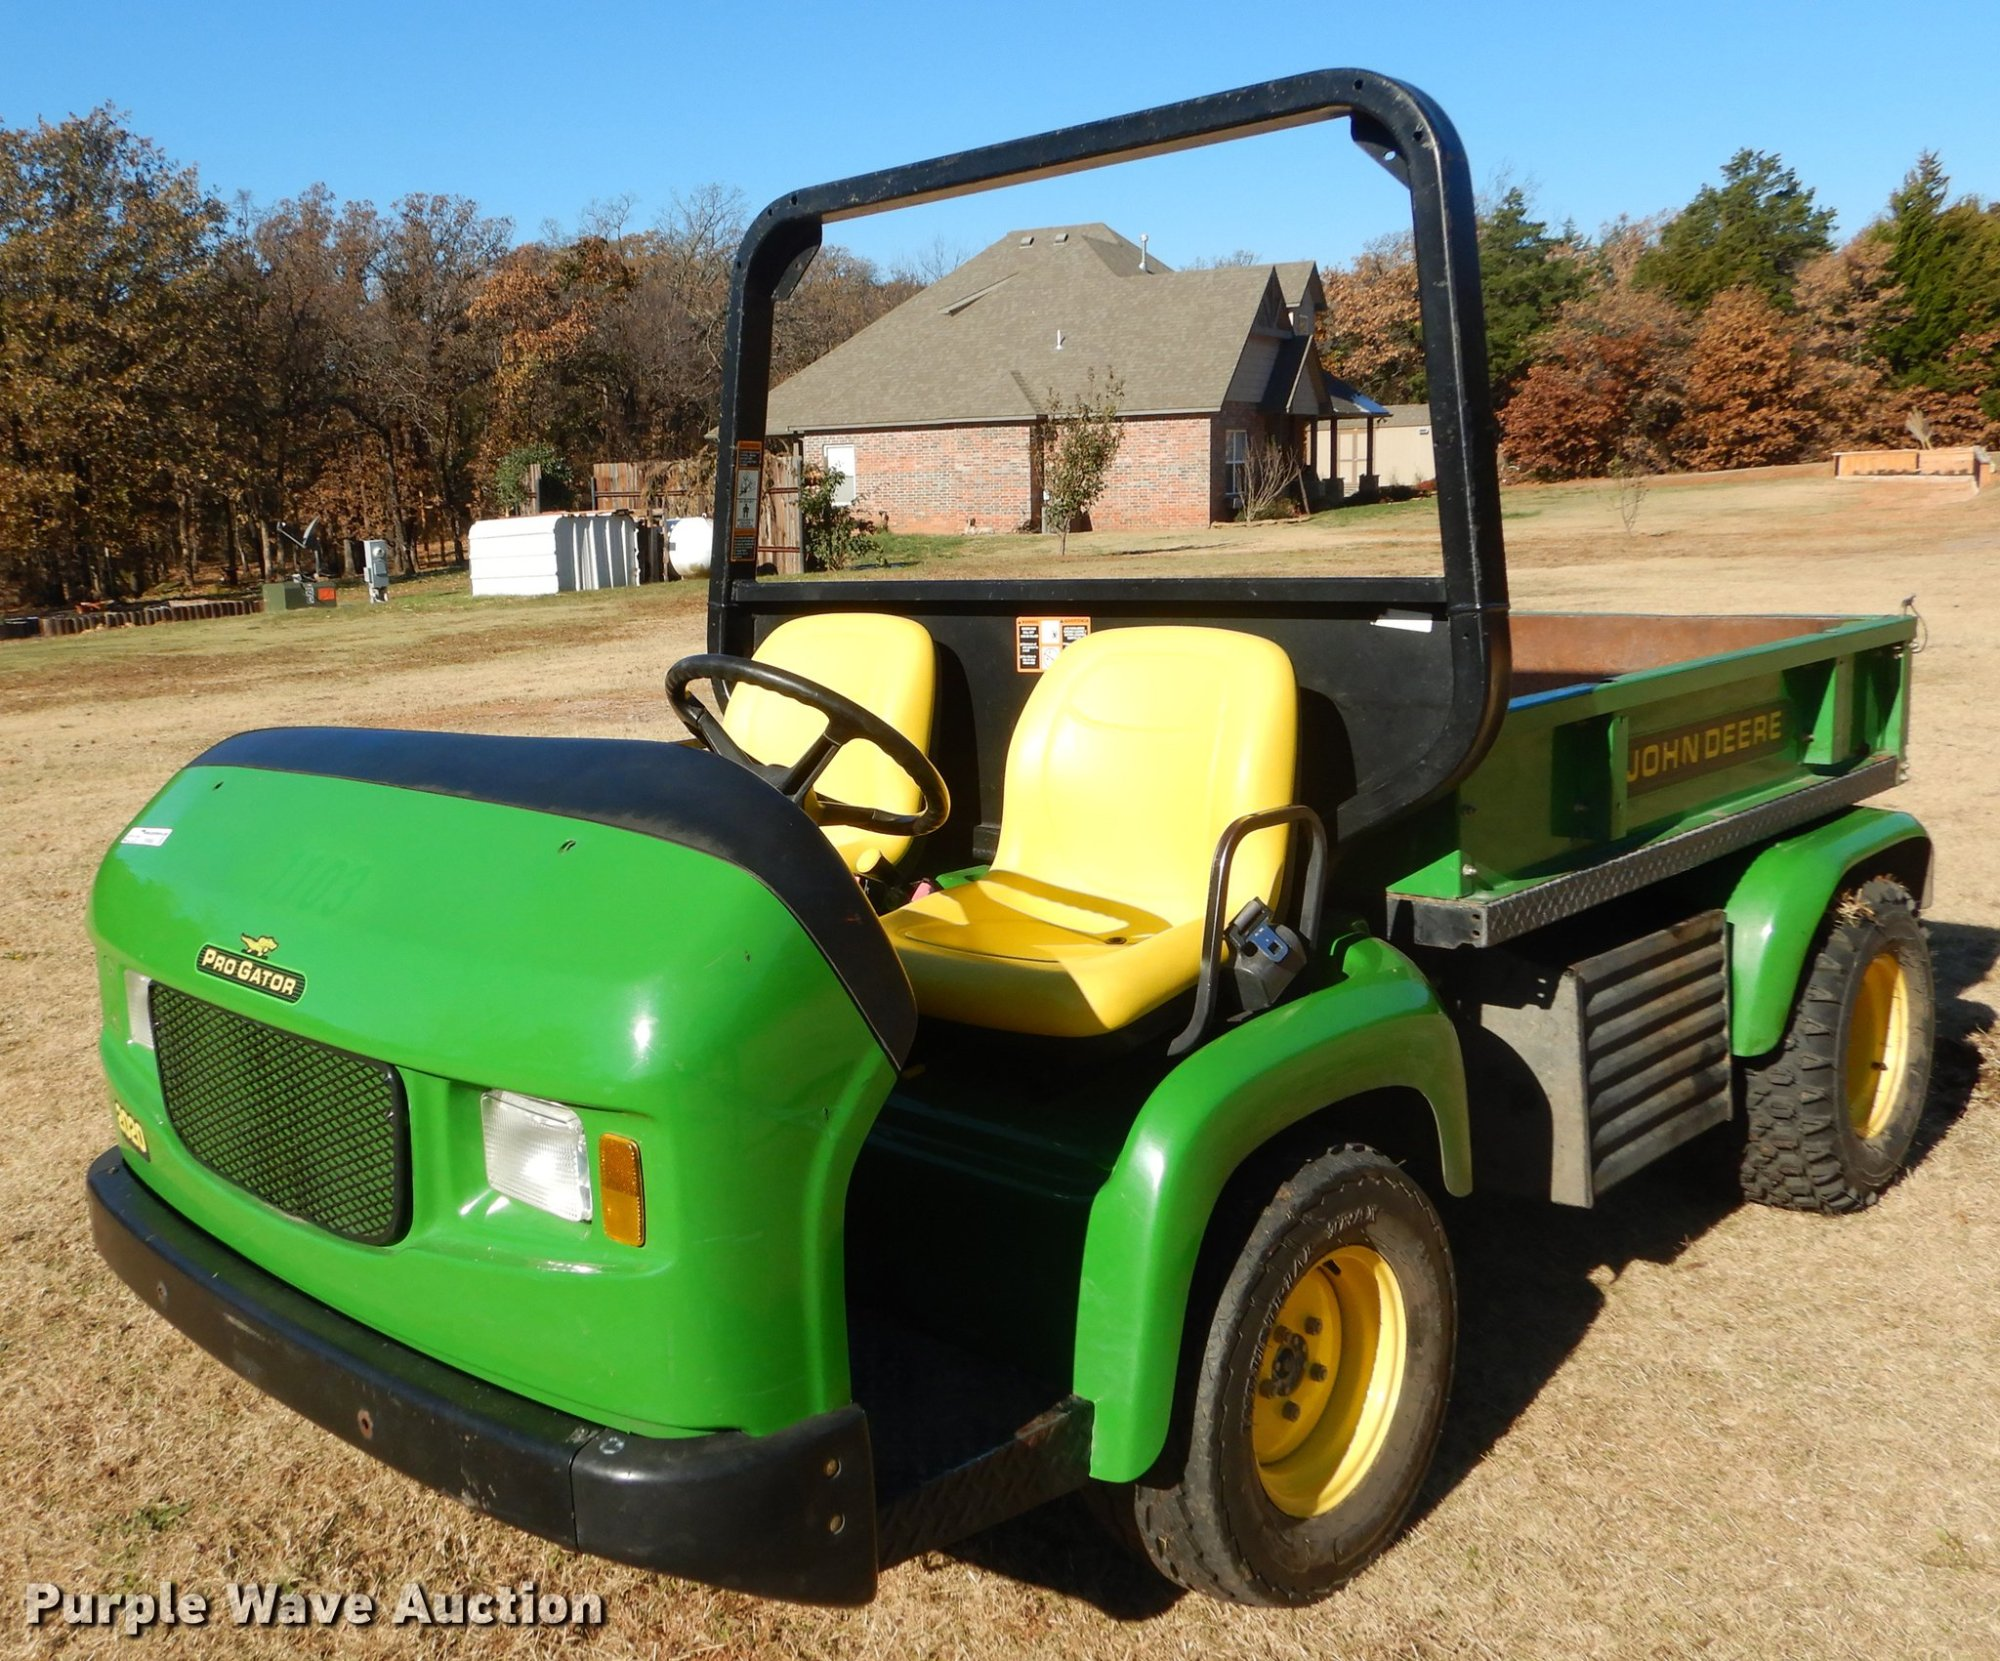 hight resolution of  2006 john deere pro gator 2020 utility vehicle item ew9668 john deere 1999 s10 fuel pump wire harness